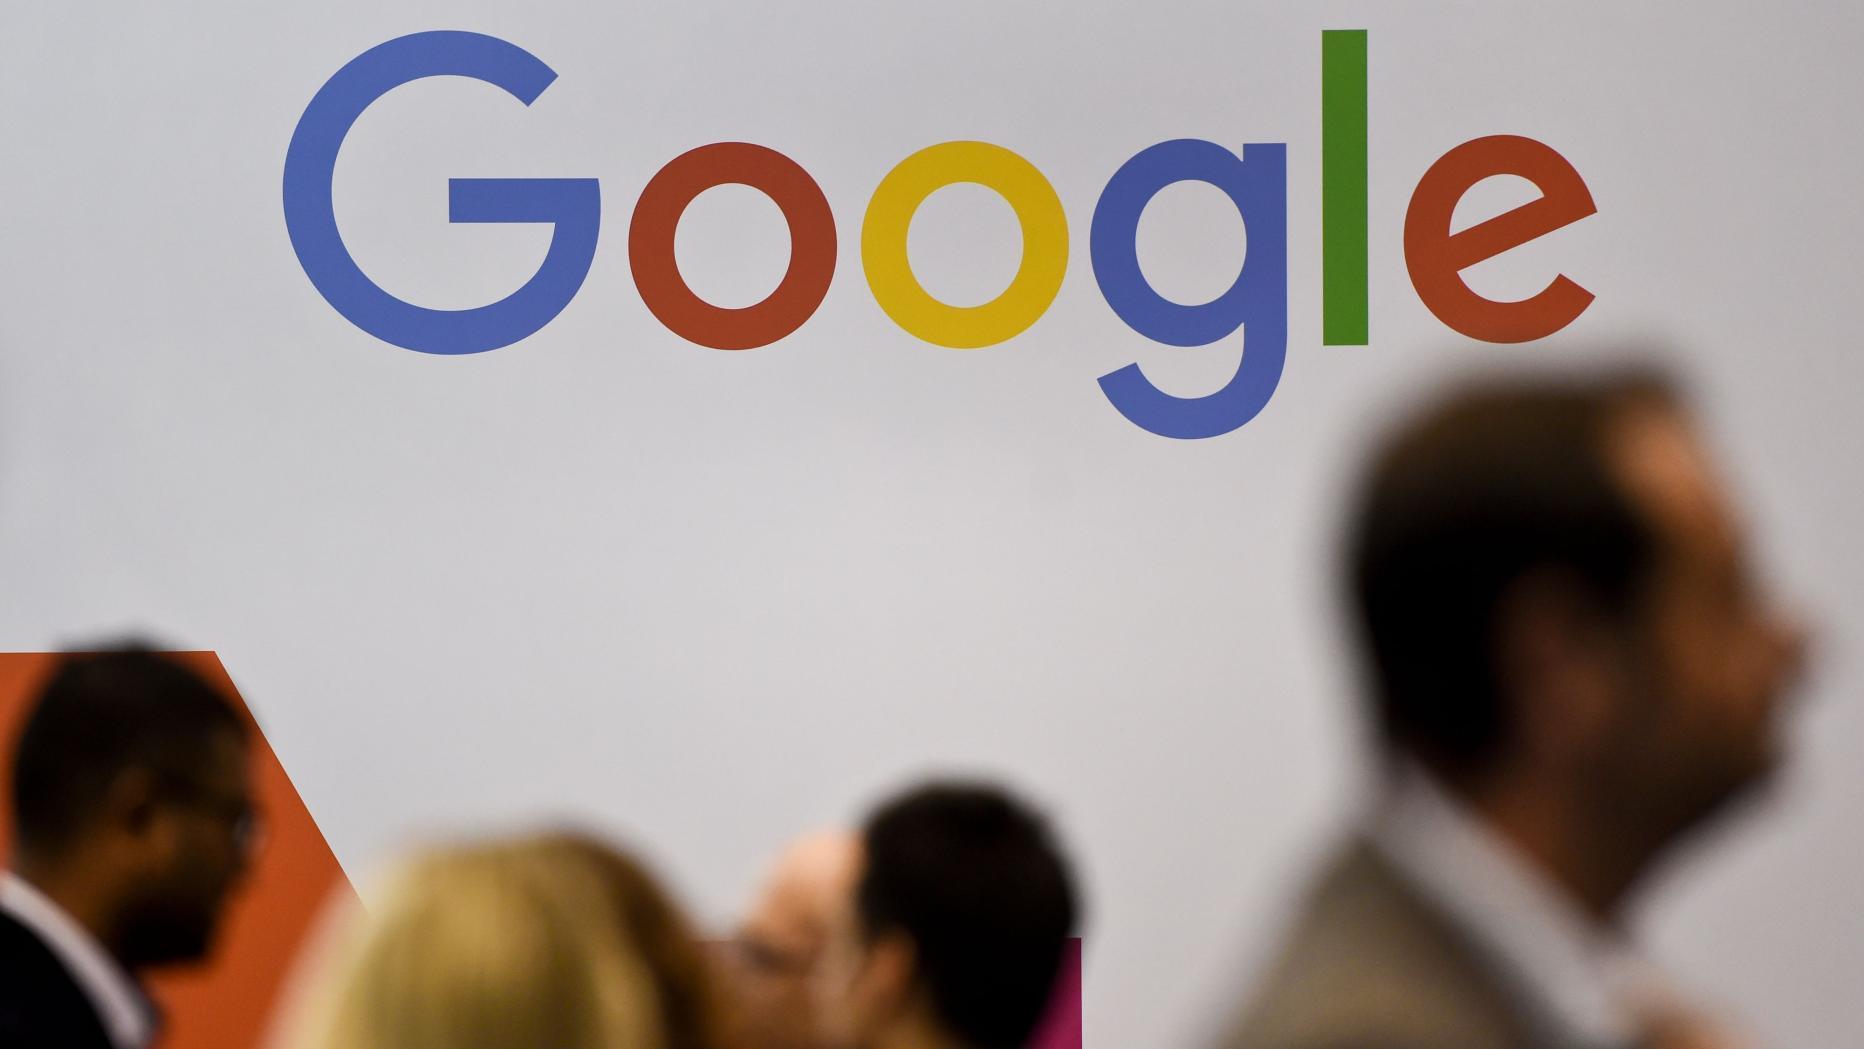 EuGH-Gutachter: Suchmaschinen müssen Links zu sensiblen Daten löschen